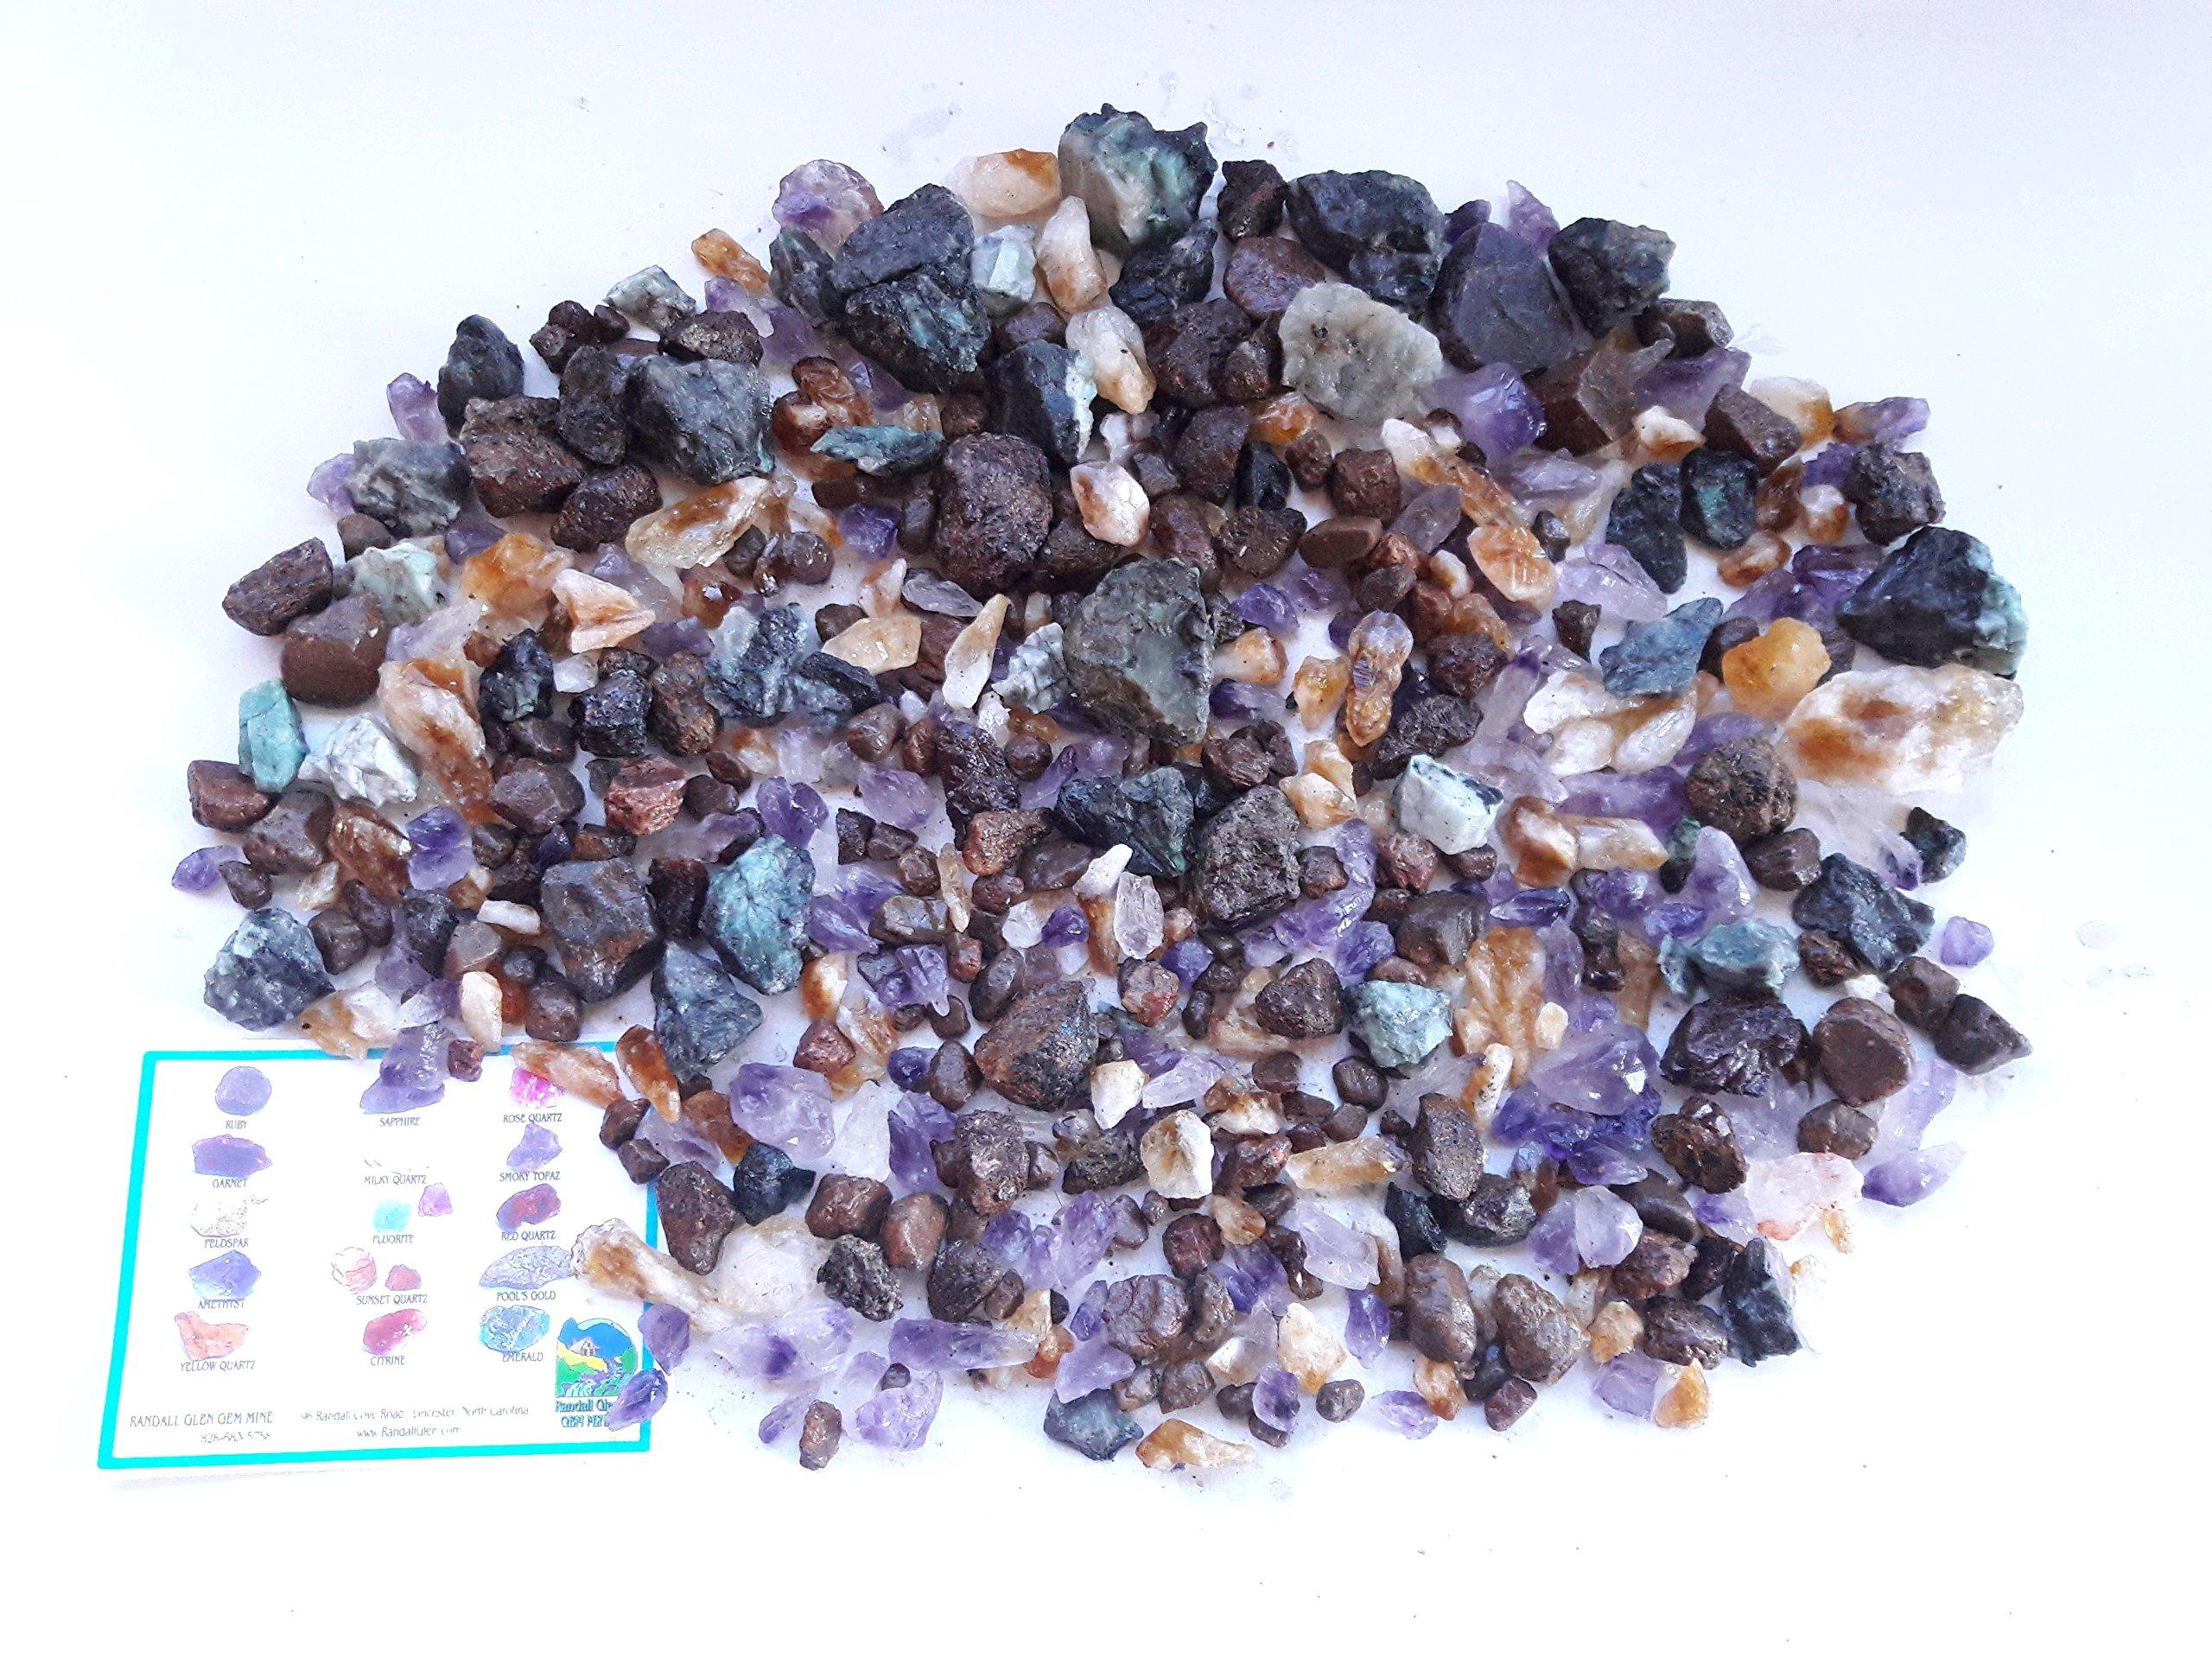 TIFFANY TREASURE BOX Home Gem Mining Kit 18,000+ Carats of Best Gems